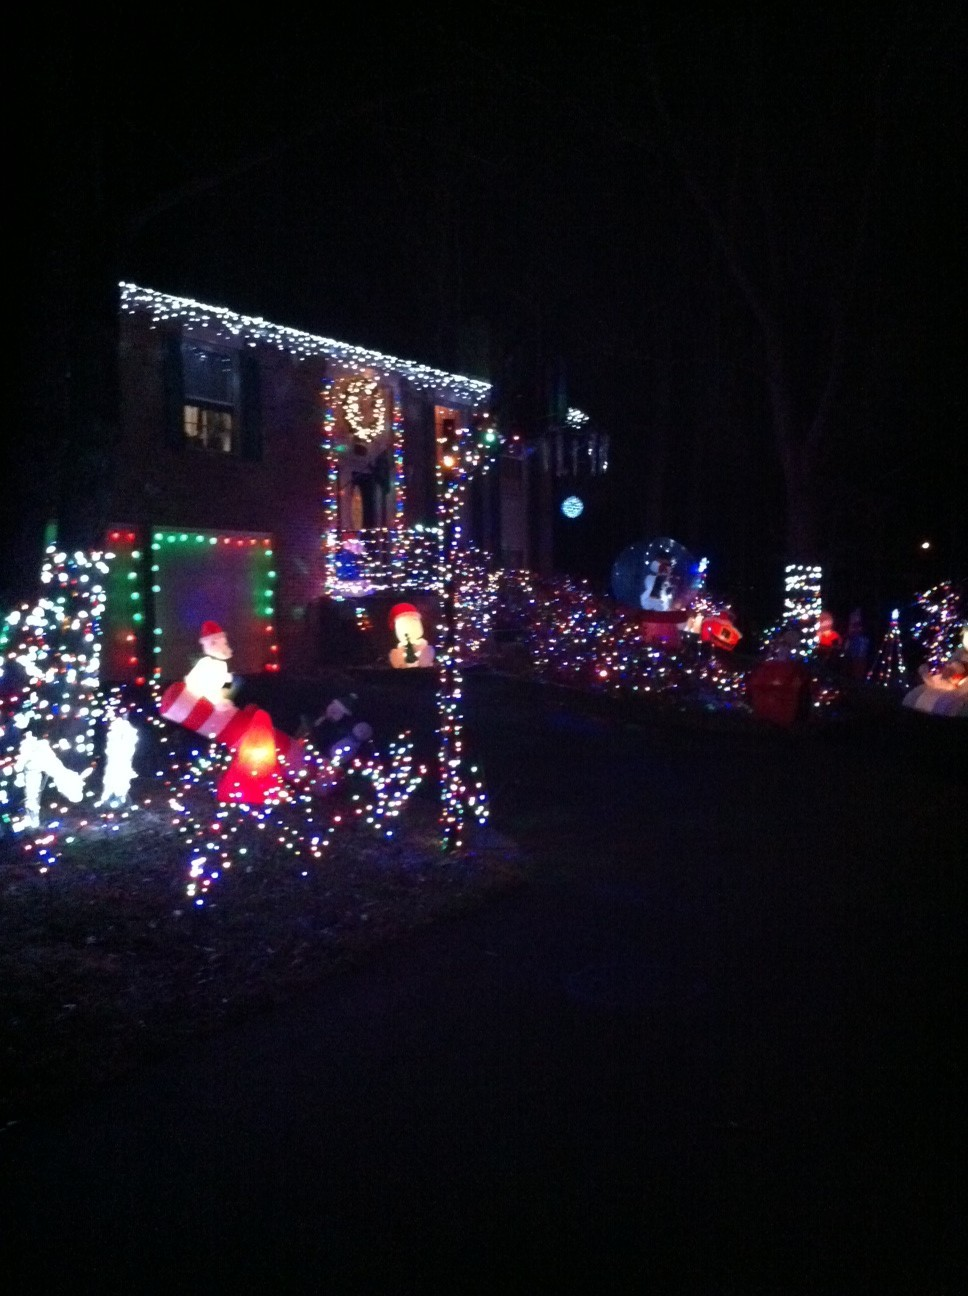 Nbc4 Springfield Va Christmas Lights 2020 Doug's Holiday Lights 2010 – NBC4 Washington